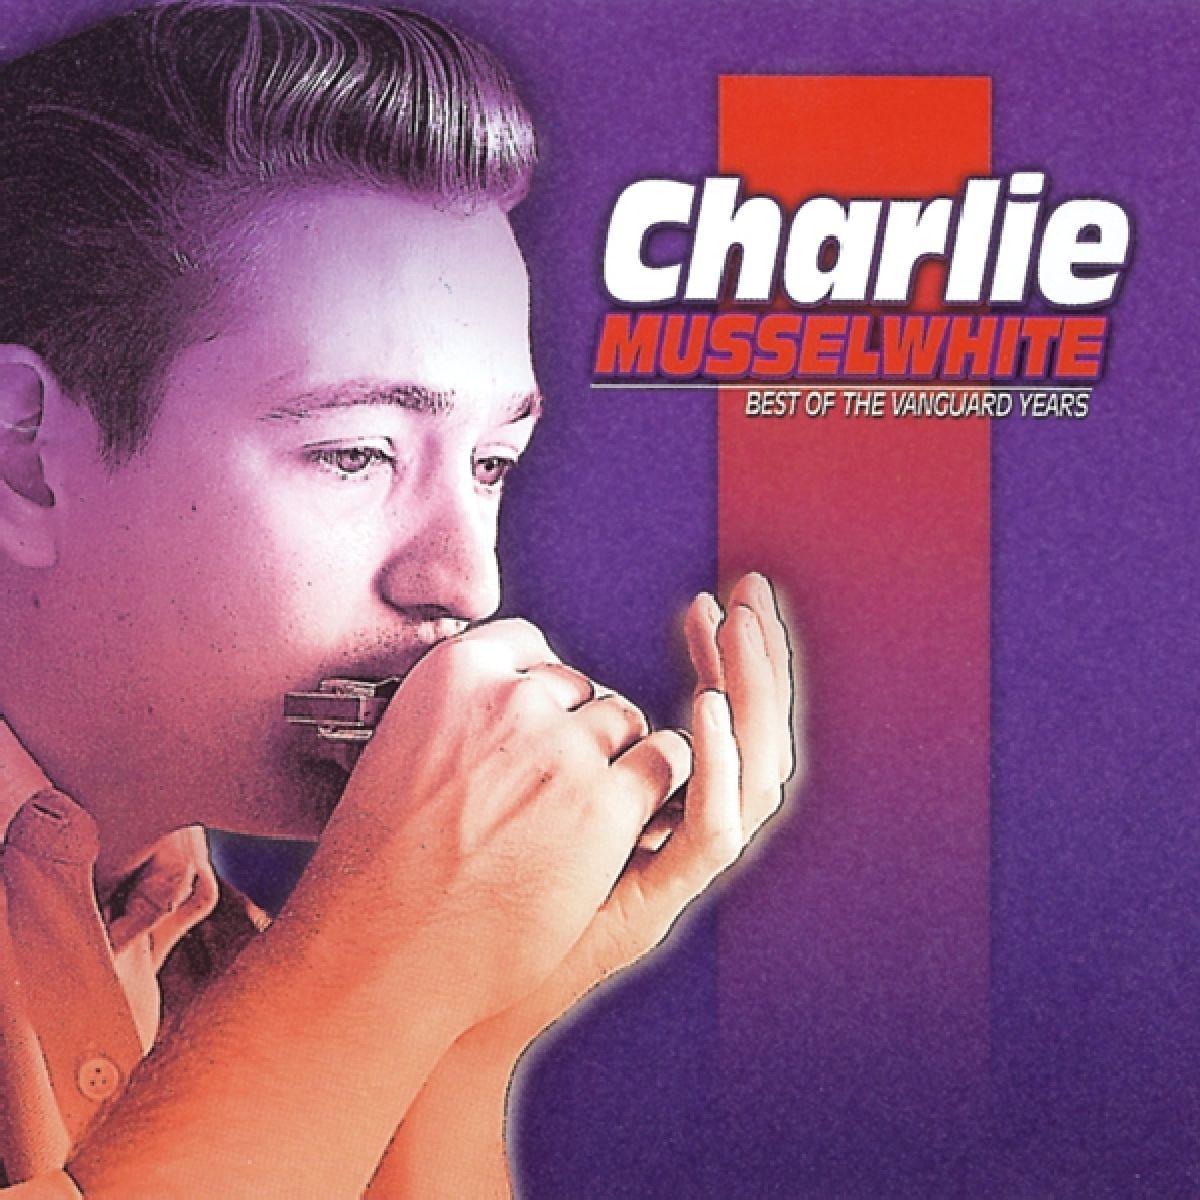 Charlie Musselwhite. Best Of The Vanguard Years